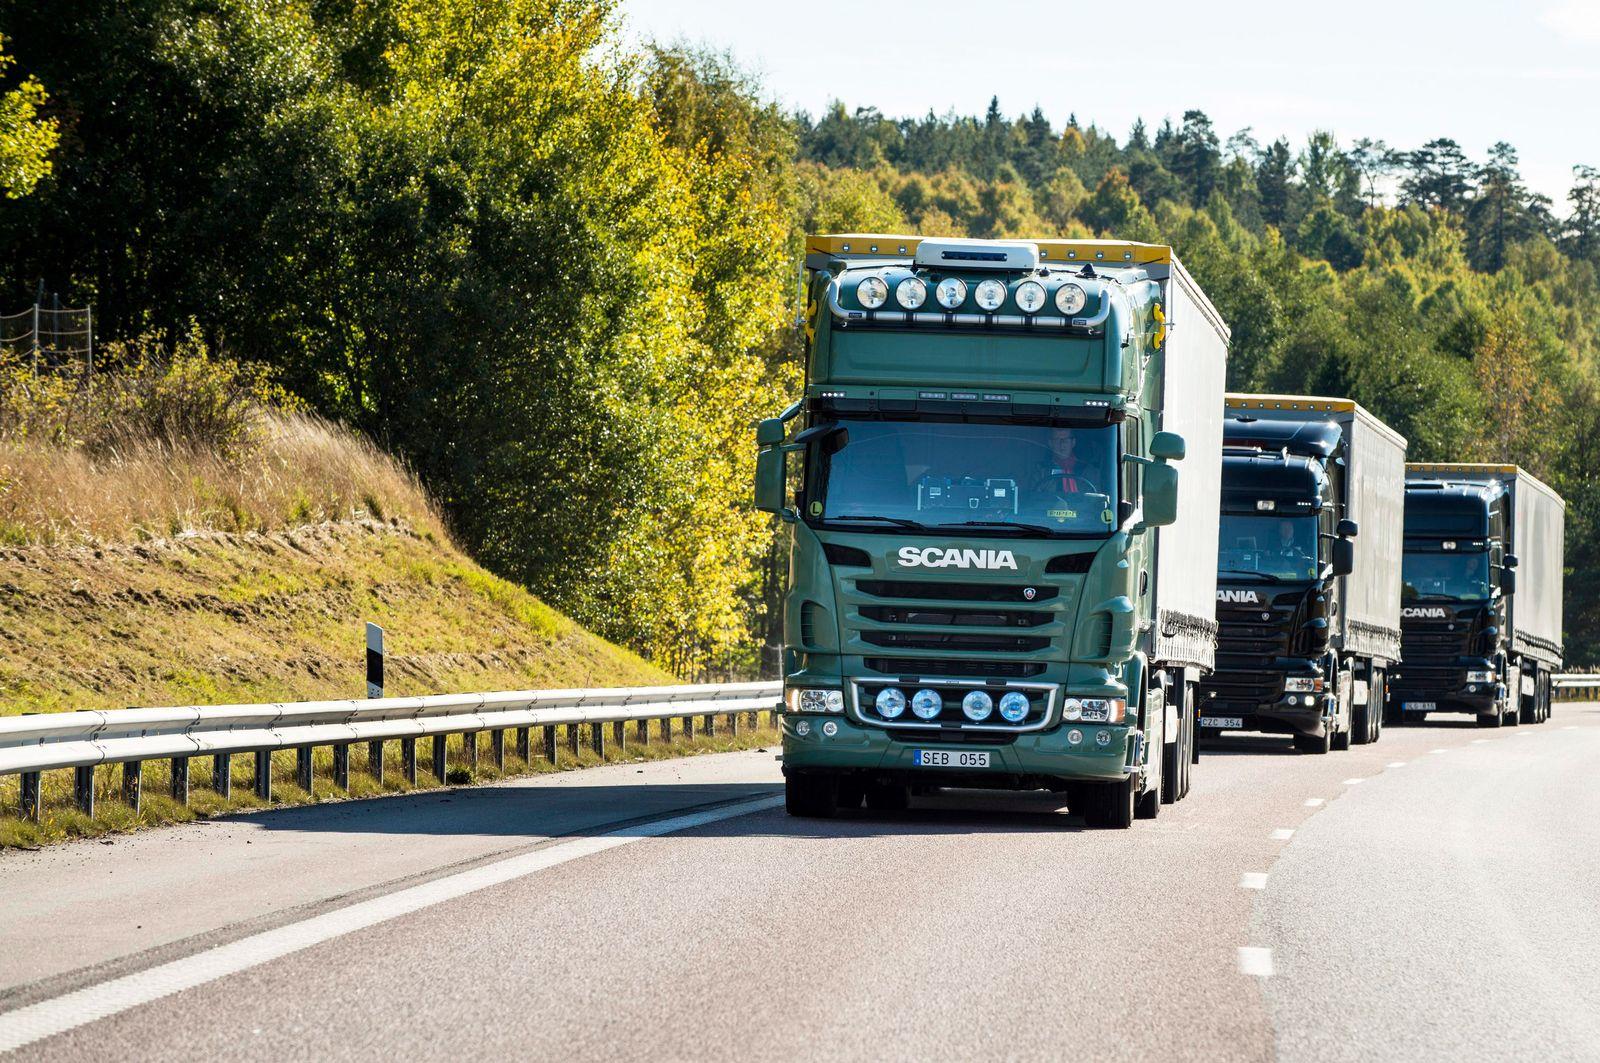 VW LKW / Scania